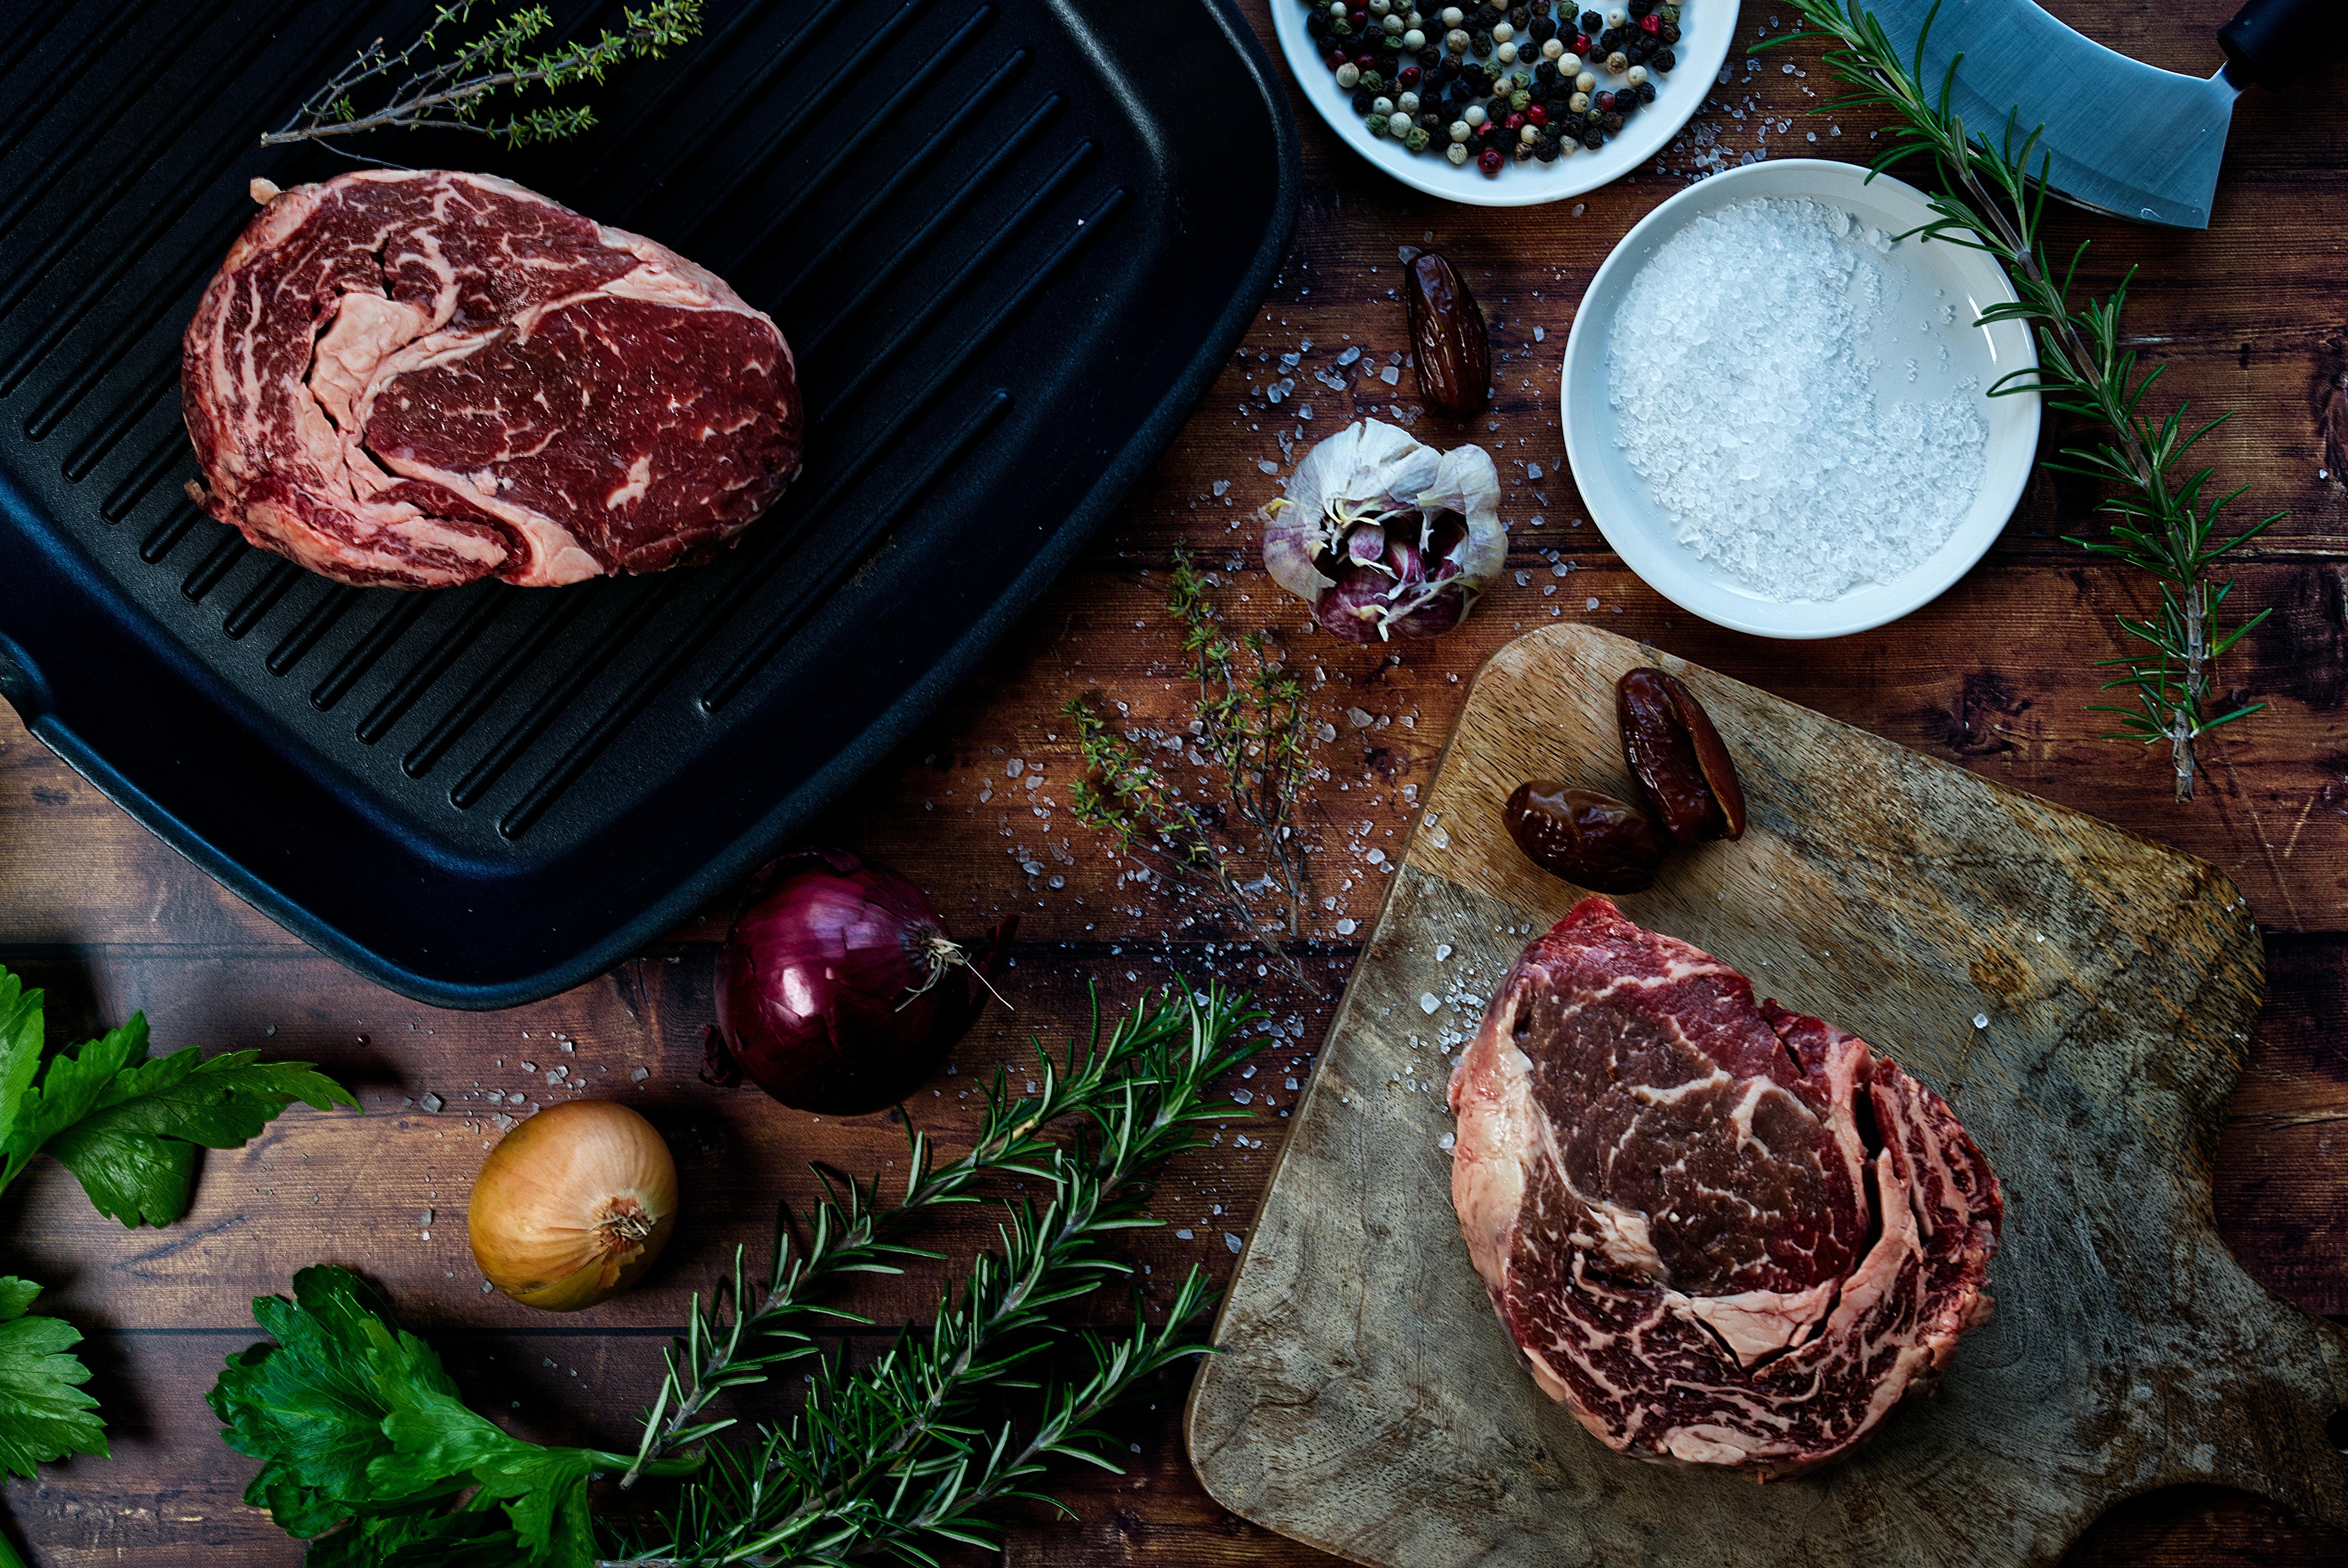 Salz muss am Carnivore Diät Plan stehen